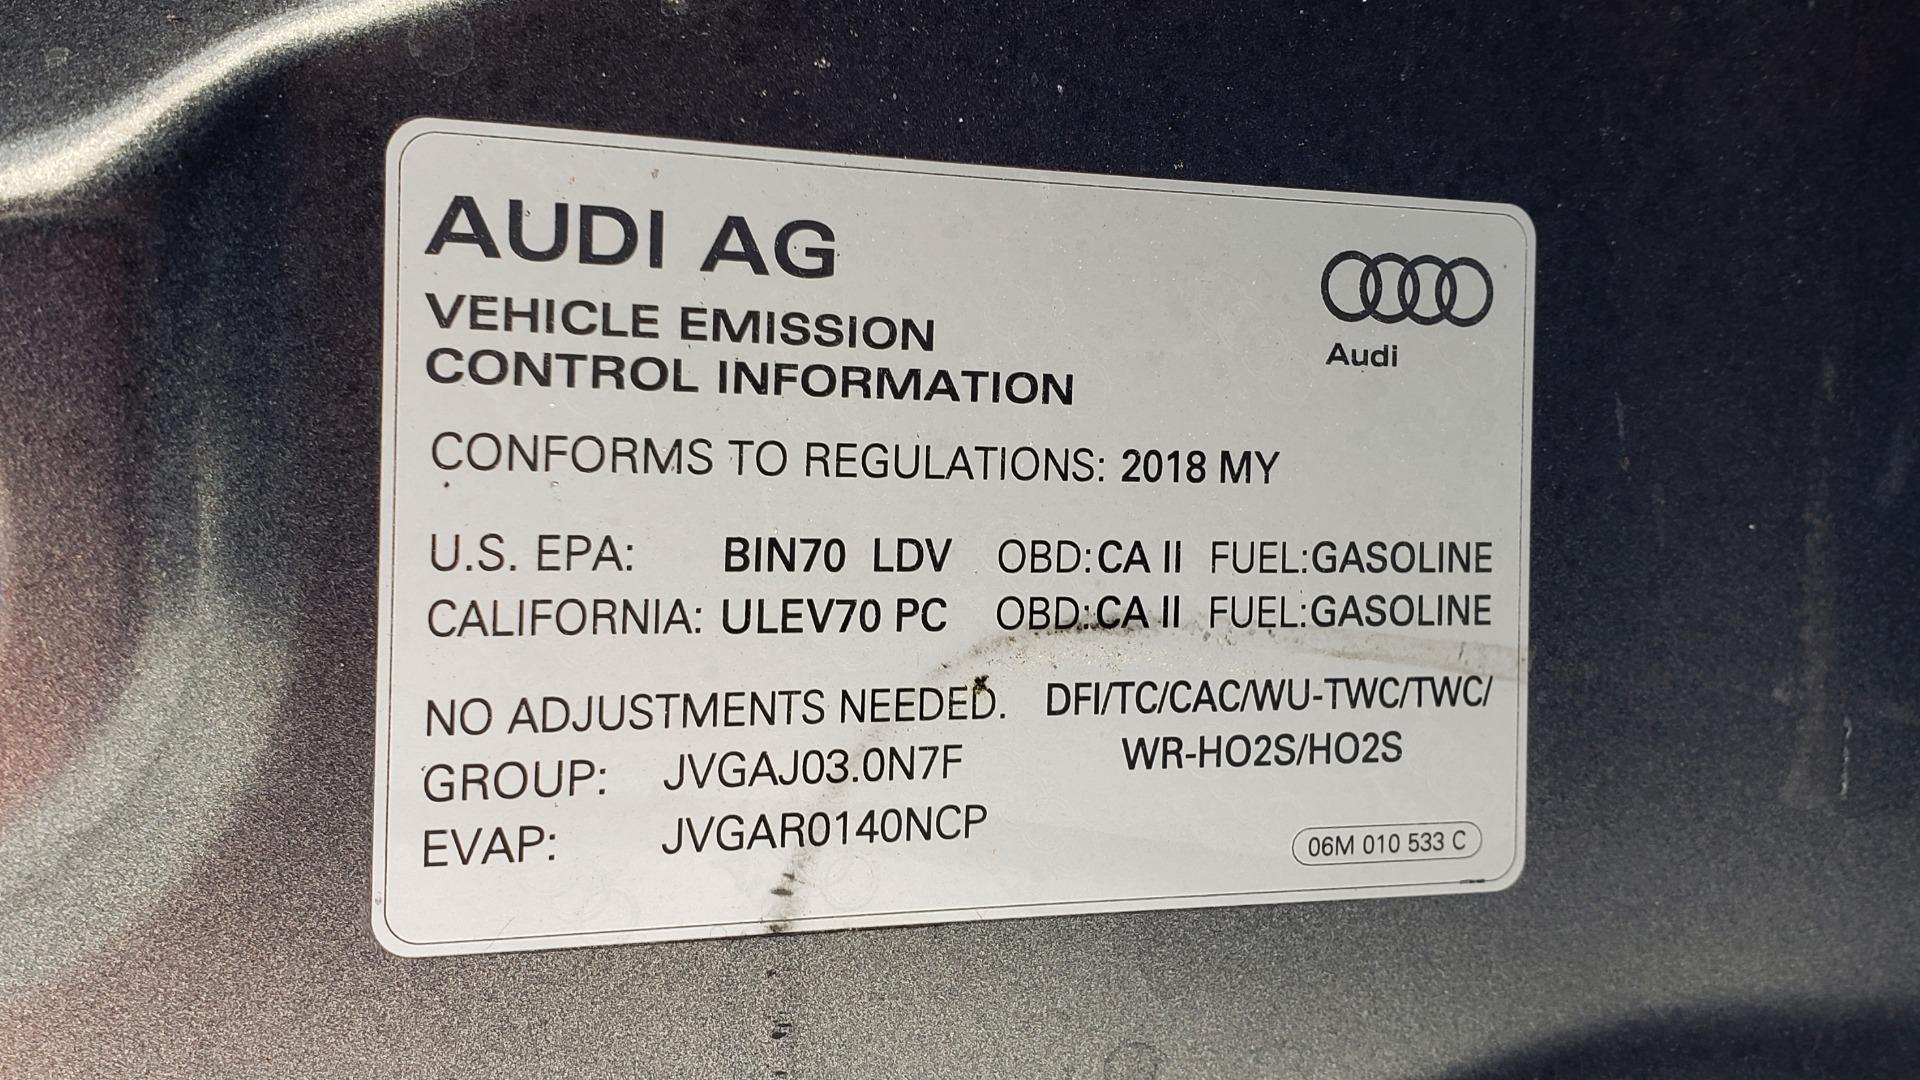 Used 2018 Audi S5 SPORTBACK PRESTIGE S-SPORT / NAV / SUNROOF / HUD / B&O SND / REARVIEW for sale $48,995 at Formula Imports in Charlotte NC 28227 16